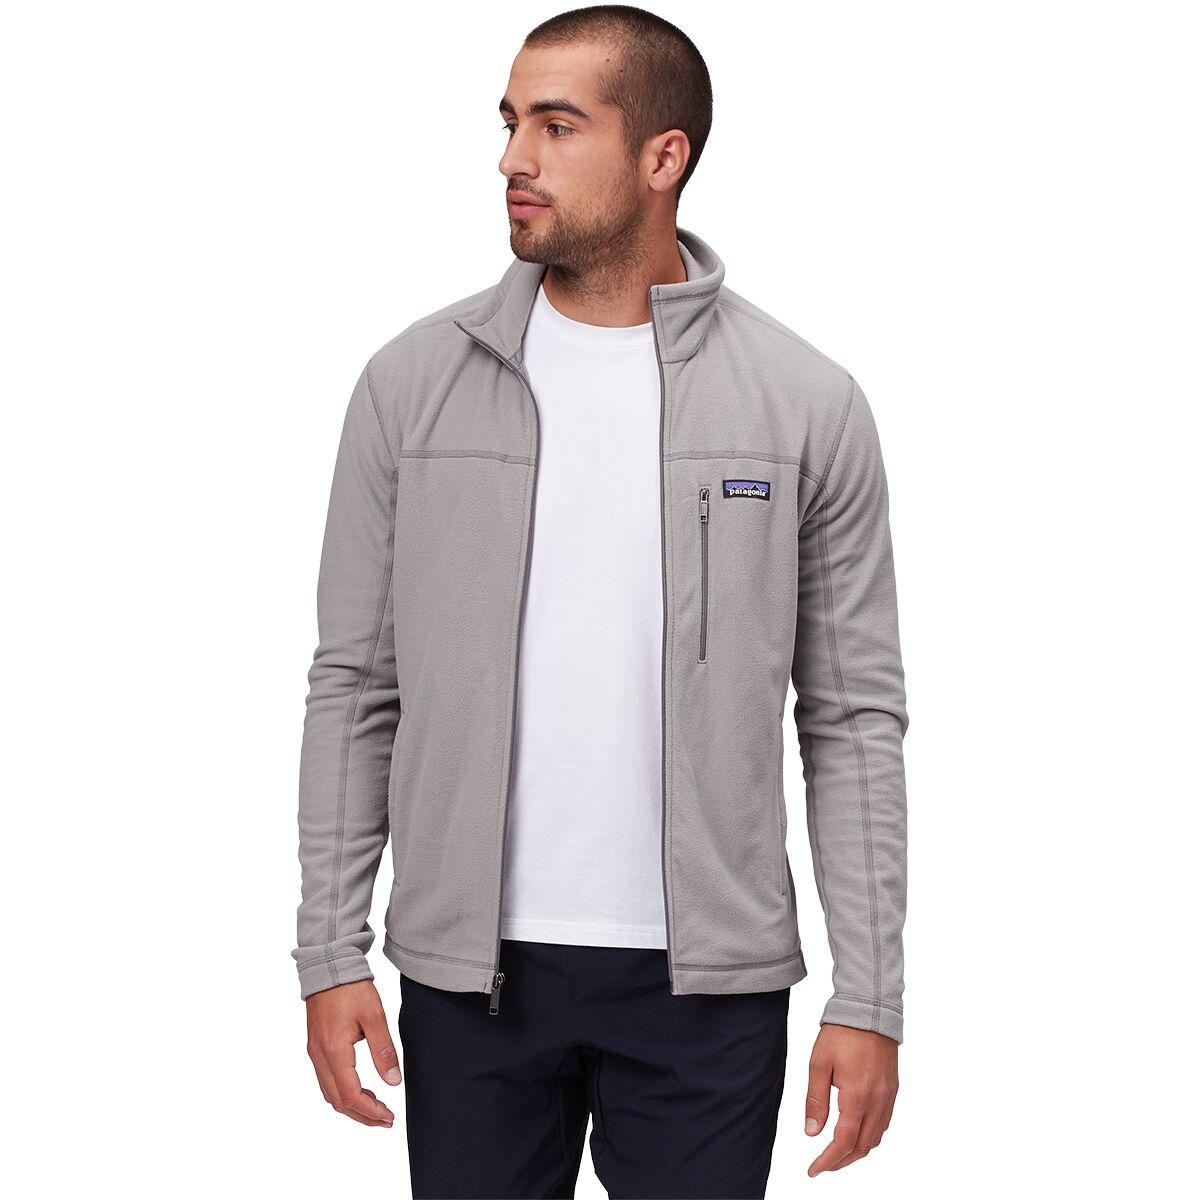 Patagonia Micro D Fleece Jacket - Men